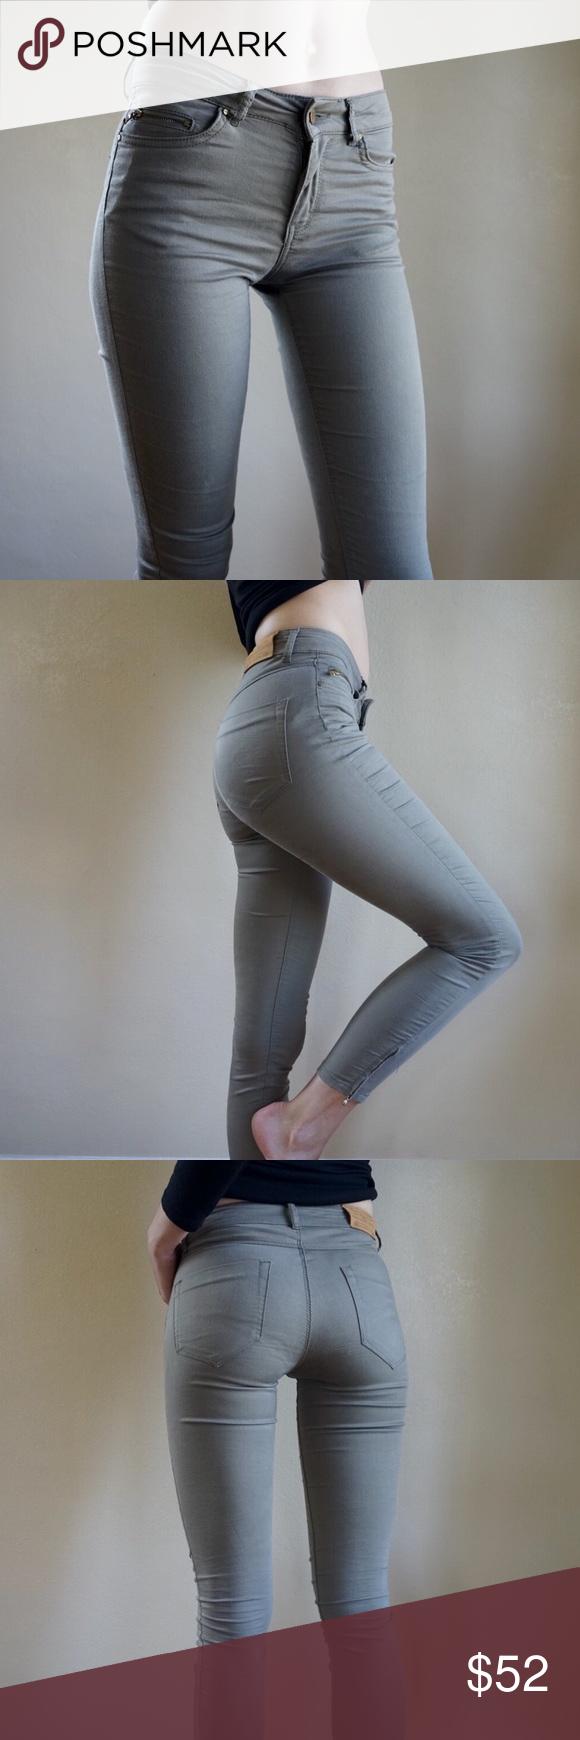 04cd7bb4 Zara army green skinny jeans Zara Basic olive / army green low rise skinny  jeans with zipper ankles. Great condition, barely worn. Fits like 25/26  waist.